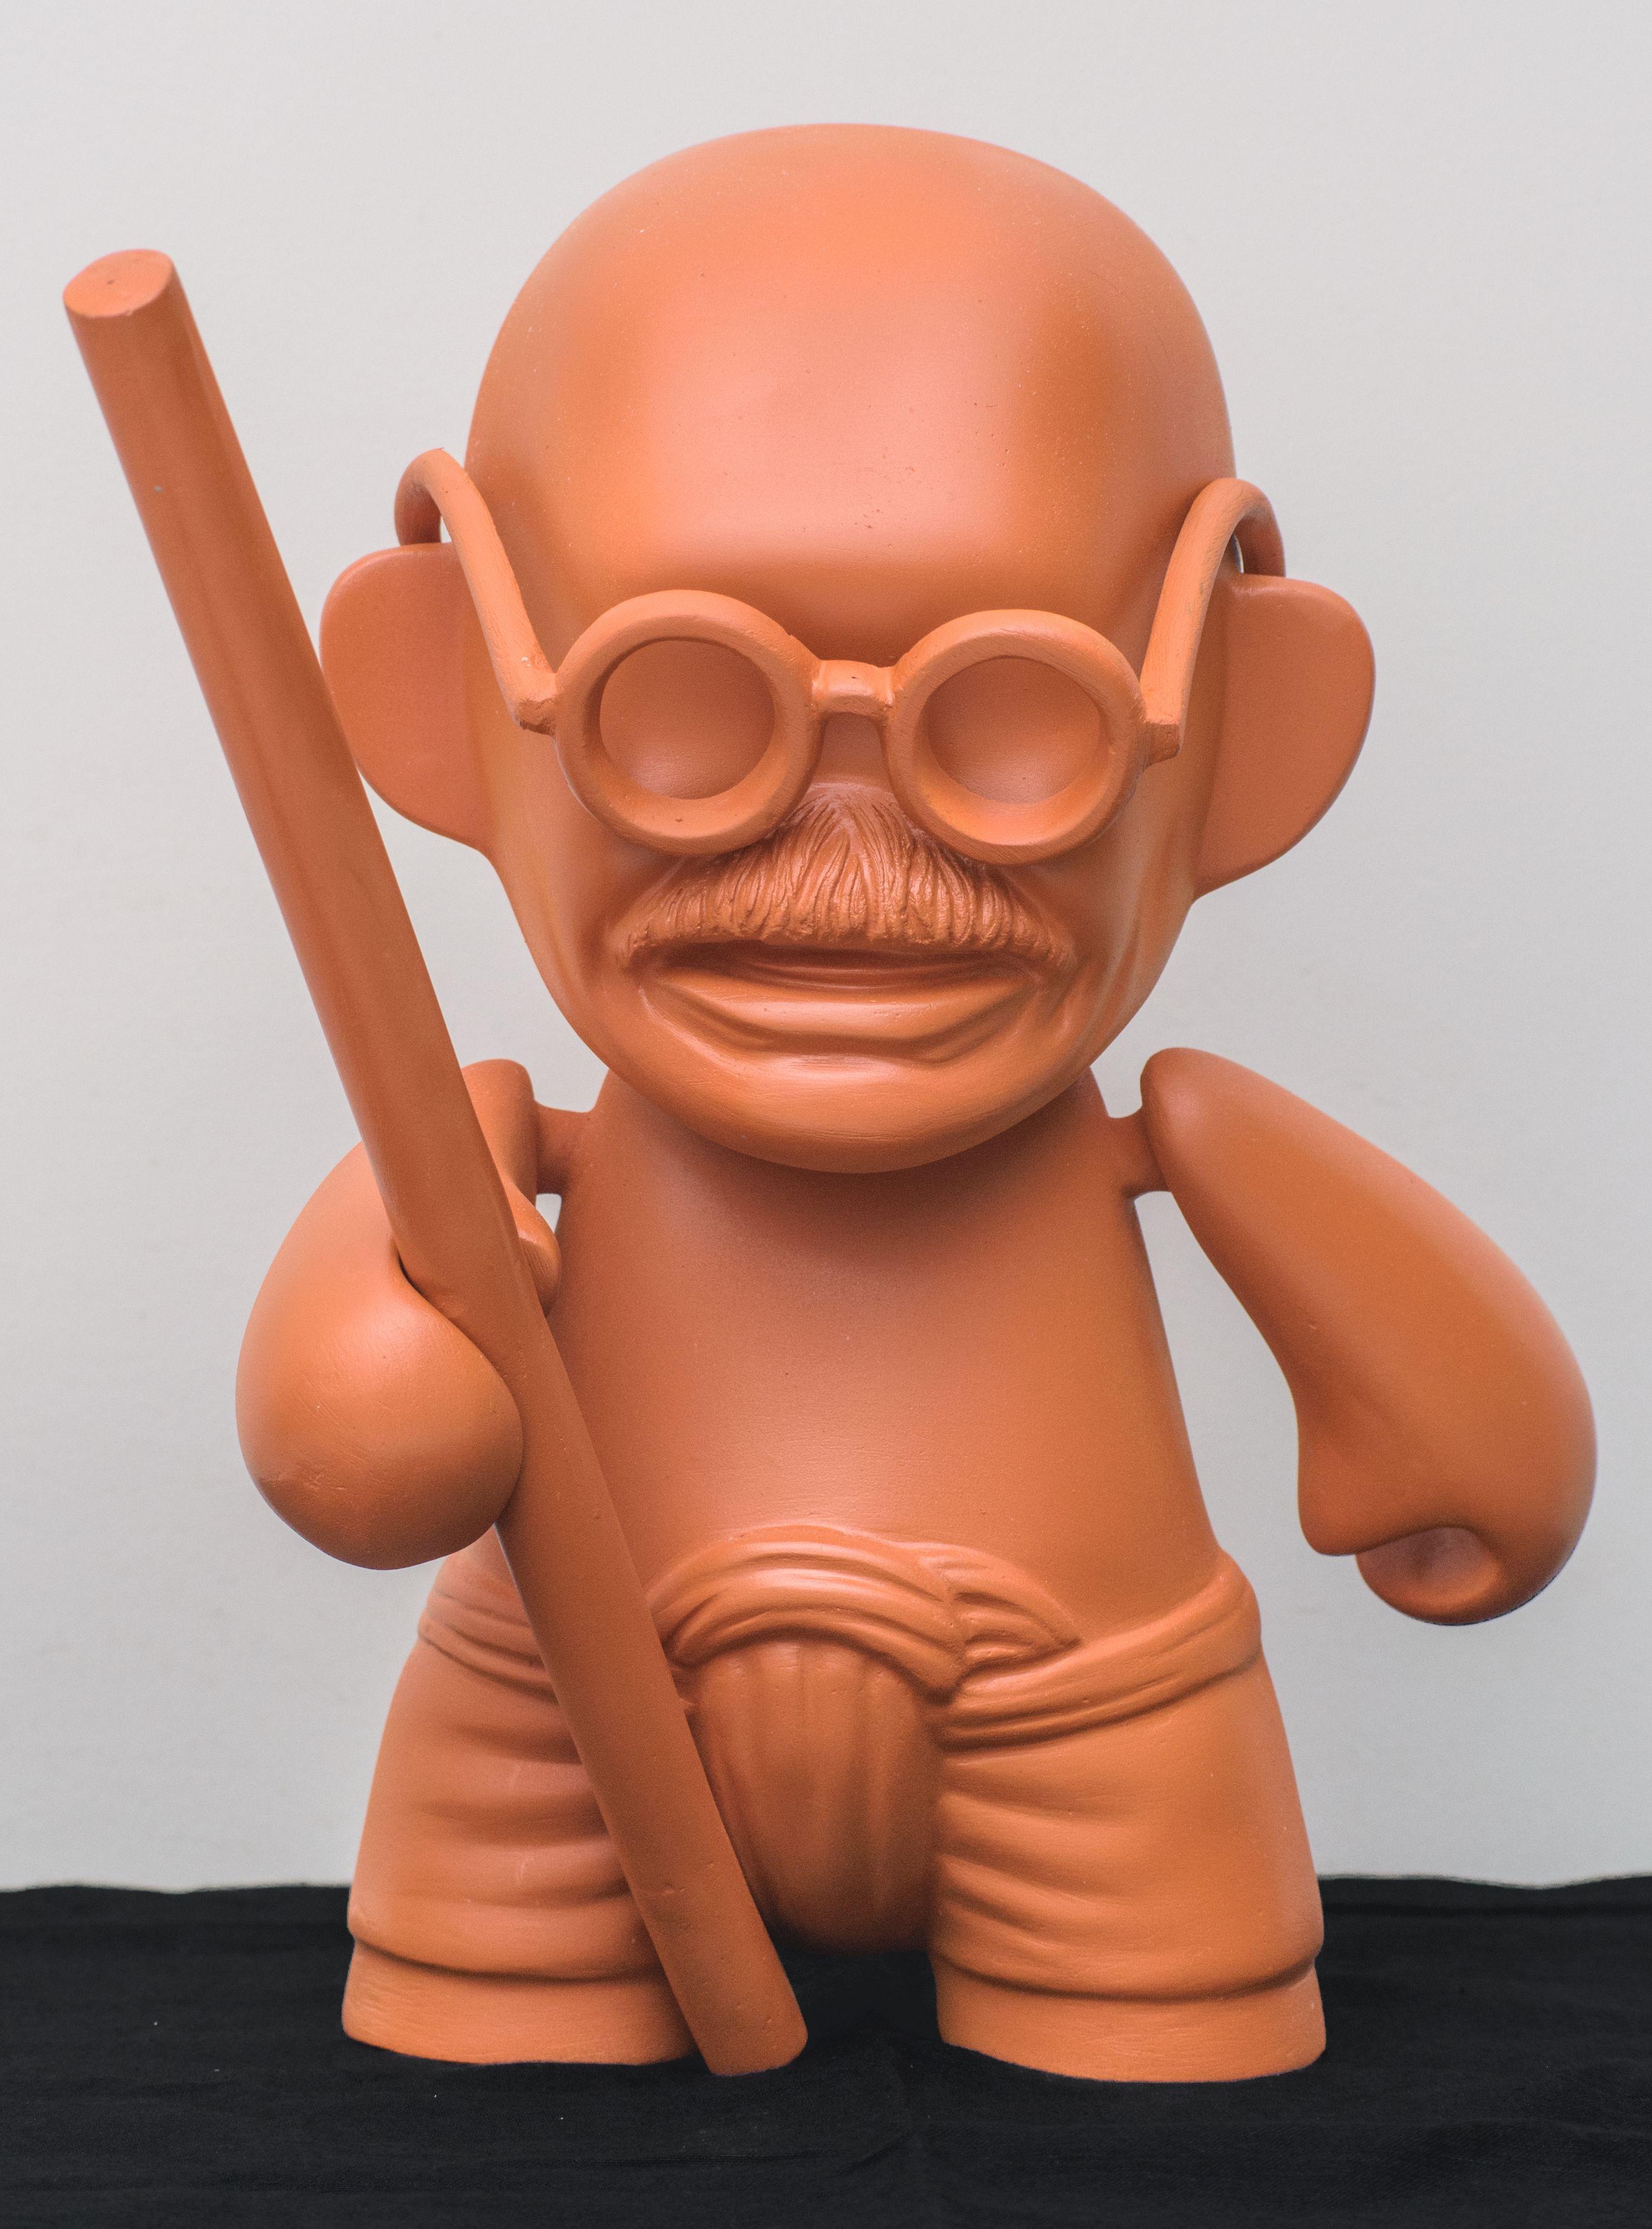 Toy Gandhi 1 (Small Munny Doll)